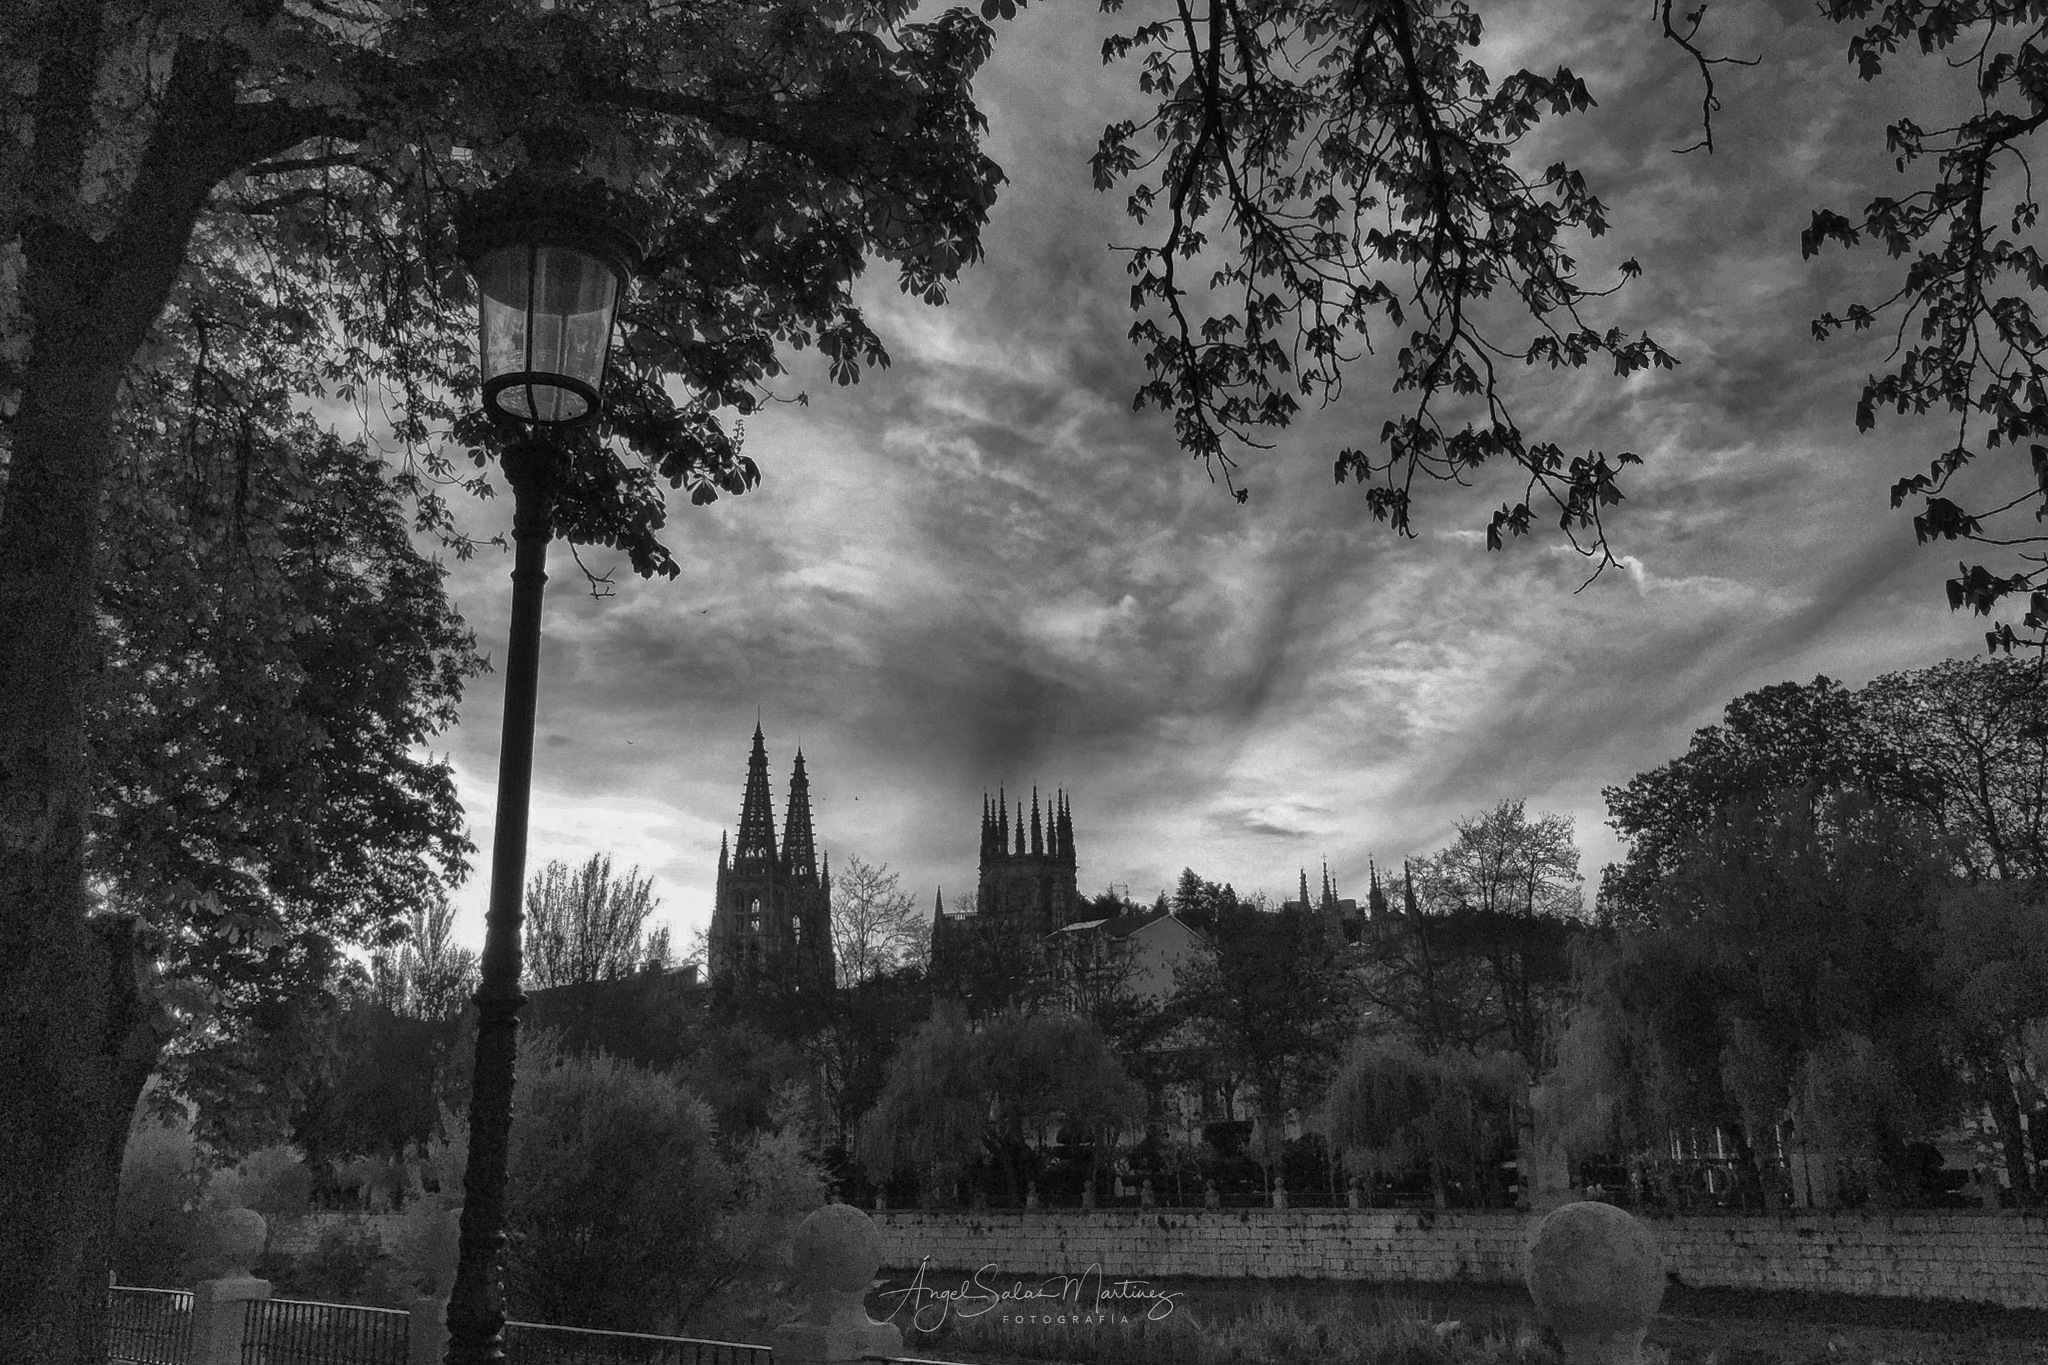 Burgos by Ángel Salas Martínez